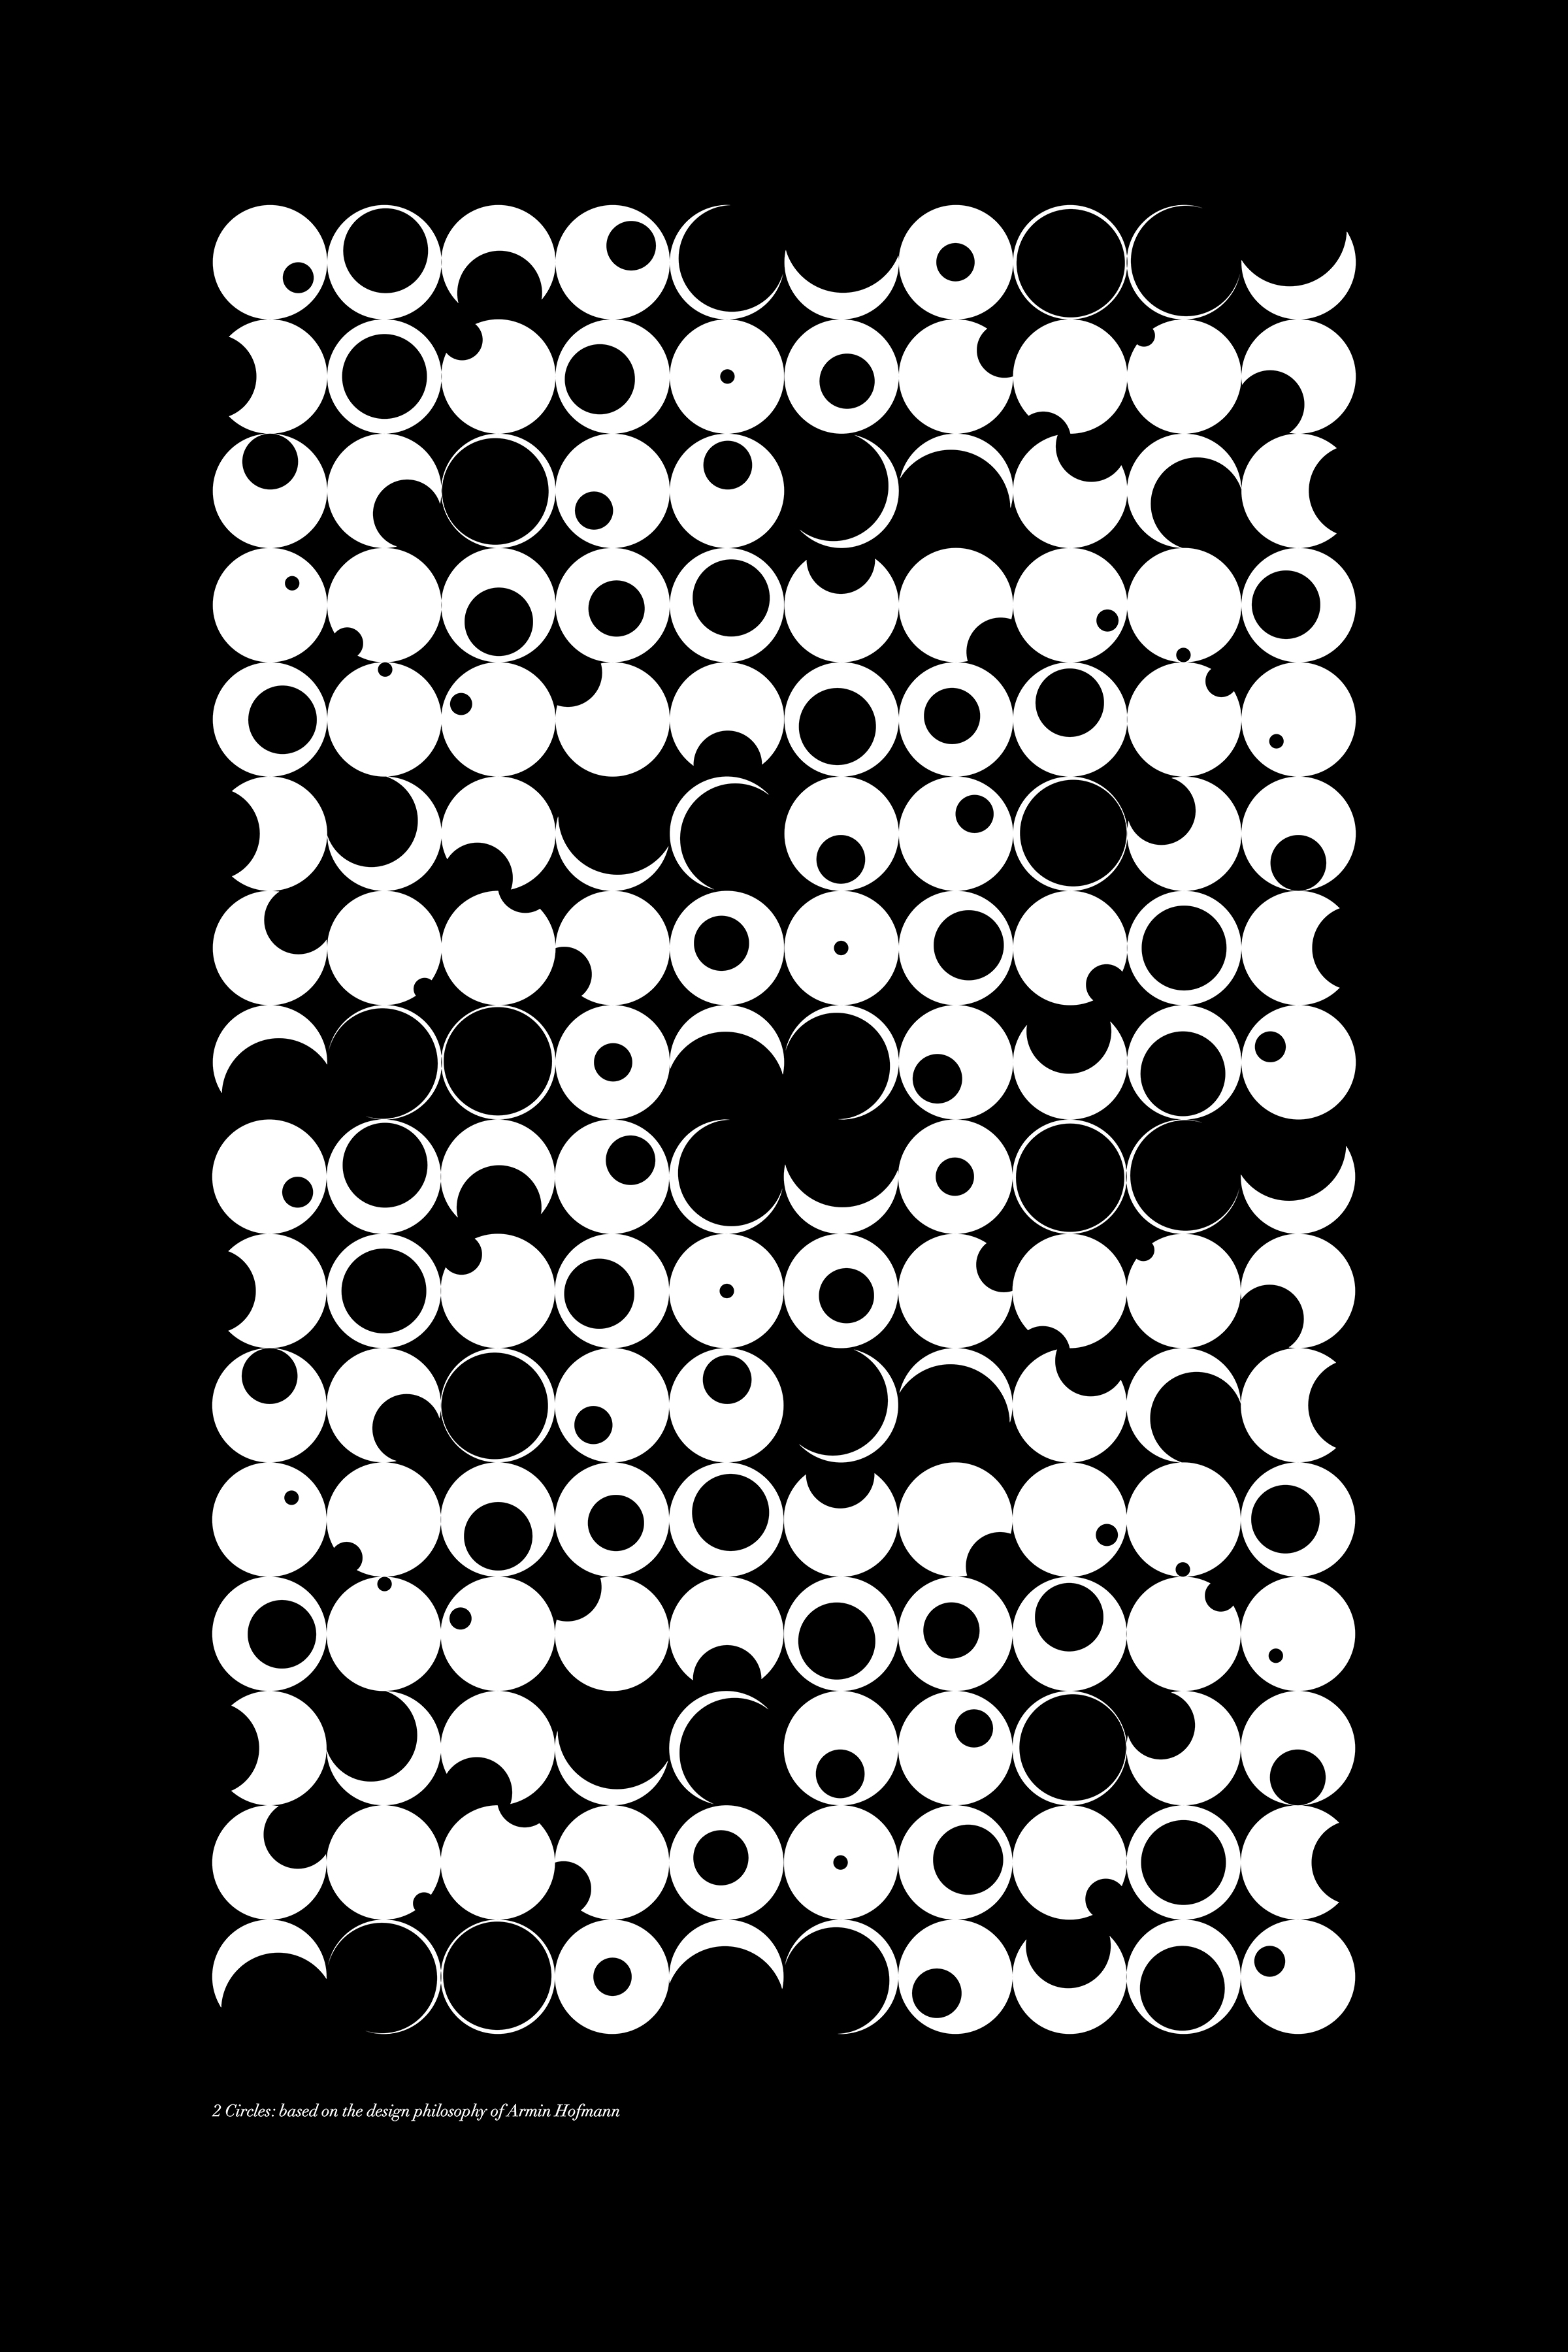 B&W Circles Inverse Step 2: 24x36